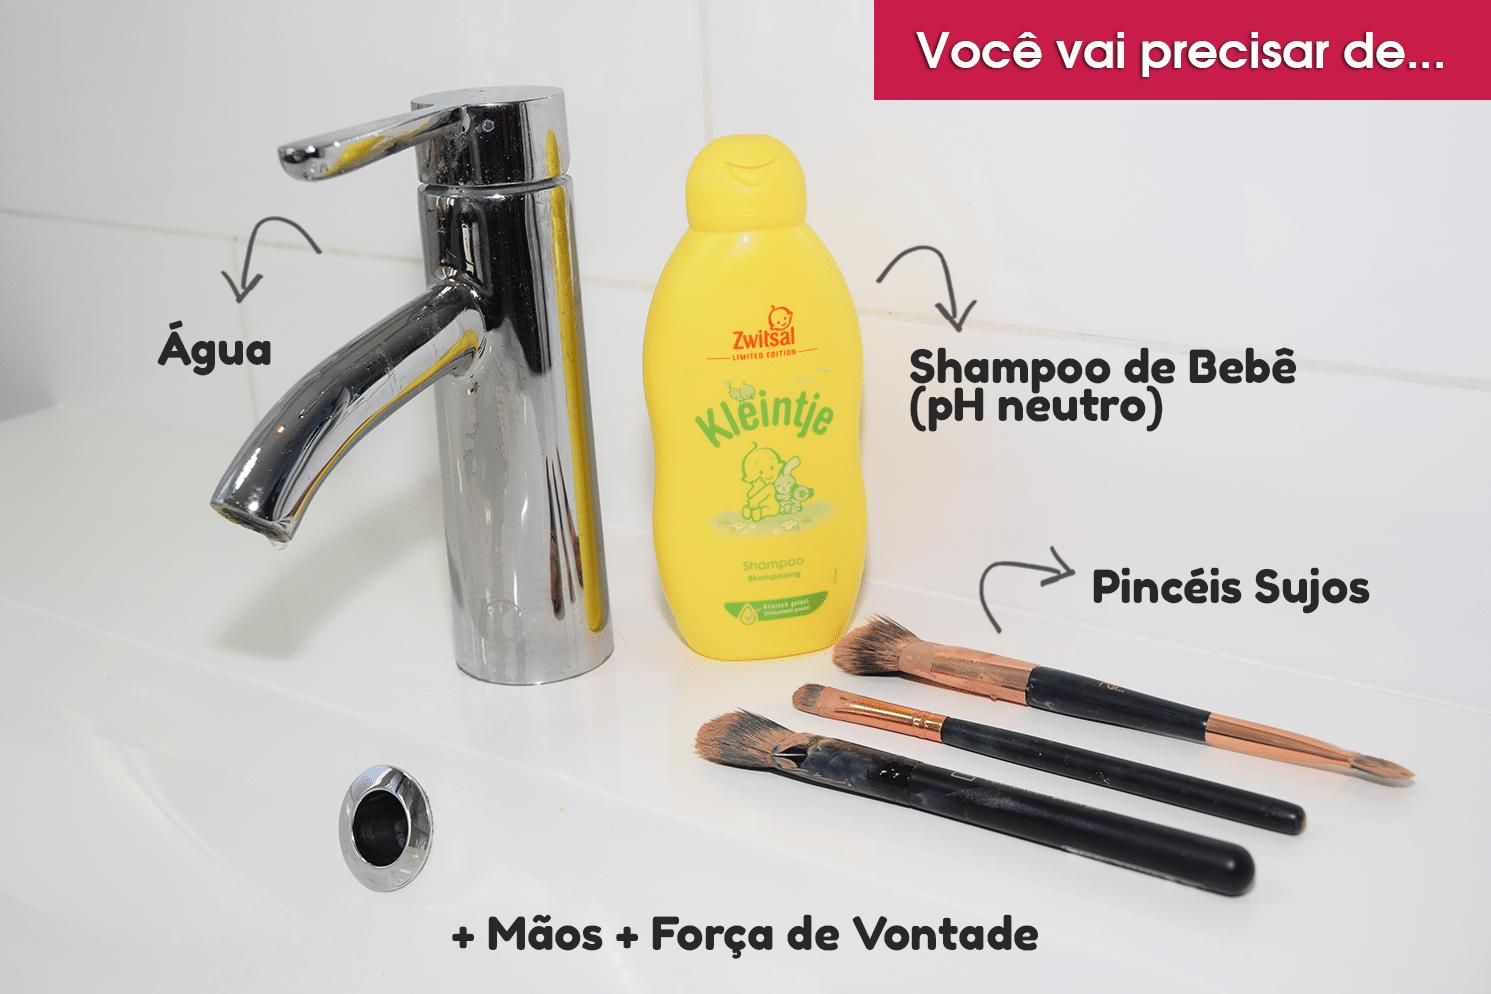 Pincel de maquiagem: 4 formas diferentes de limpar - Tudo